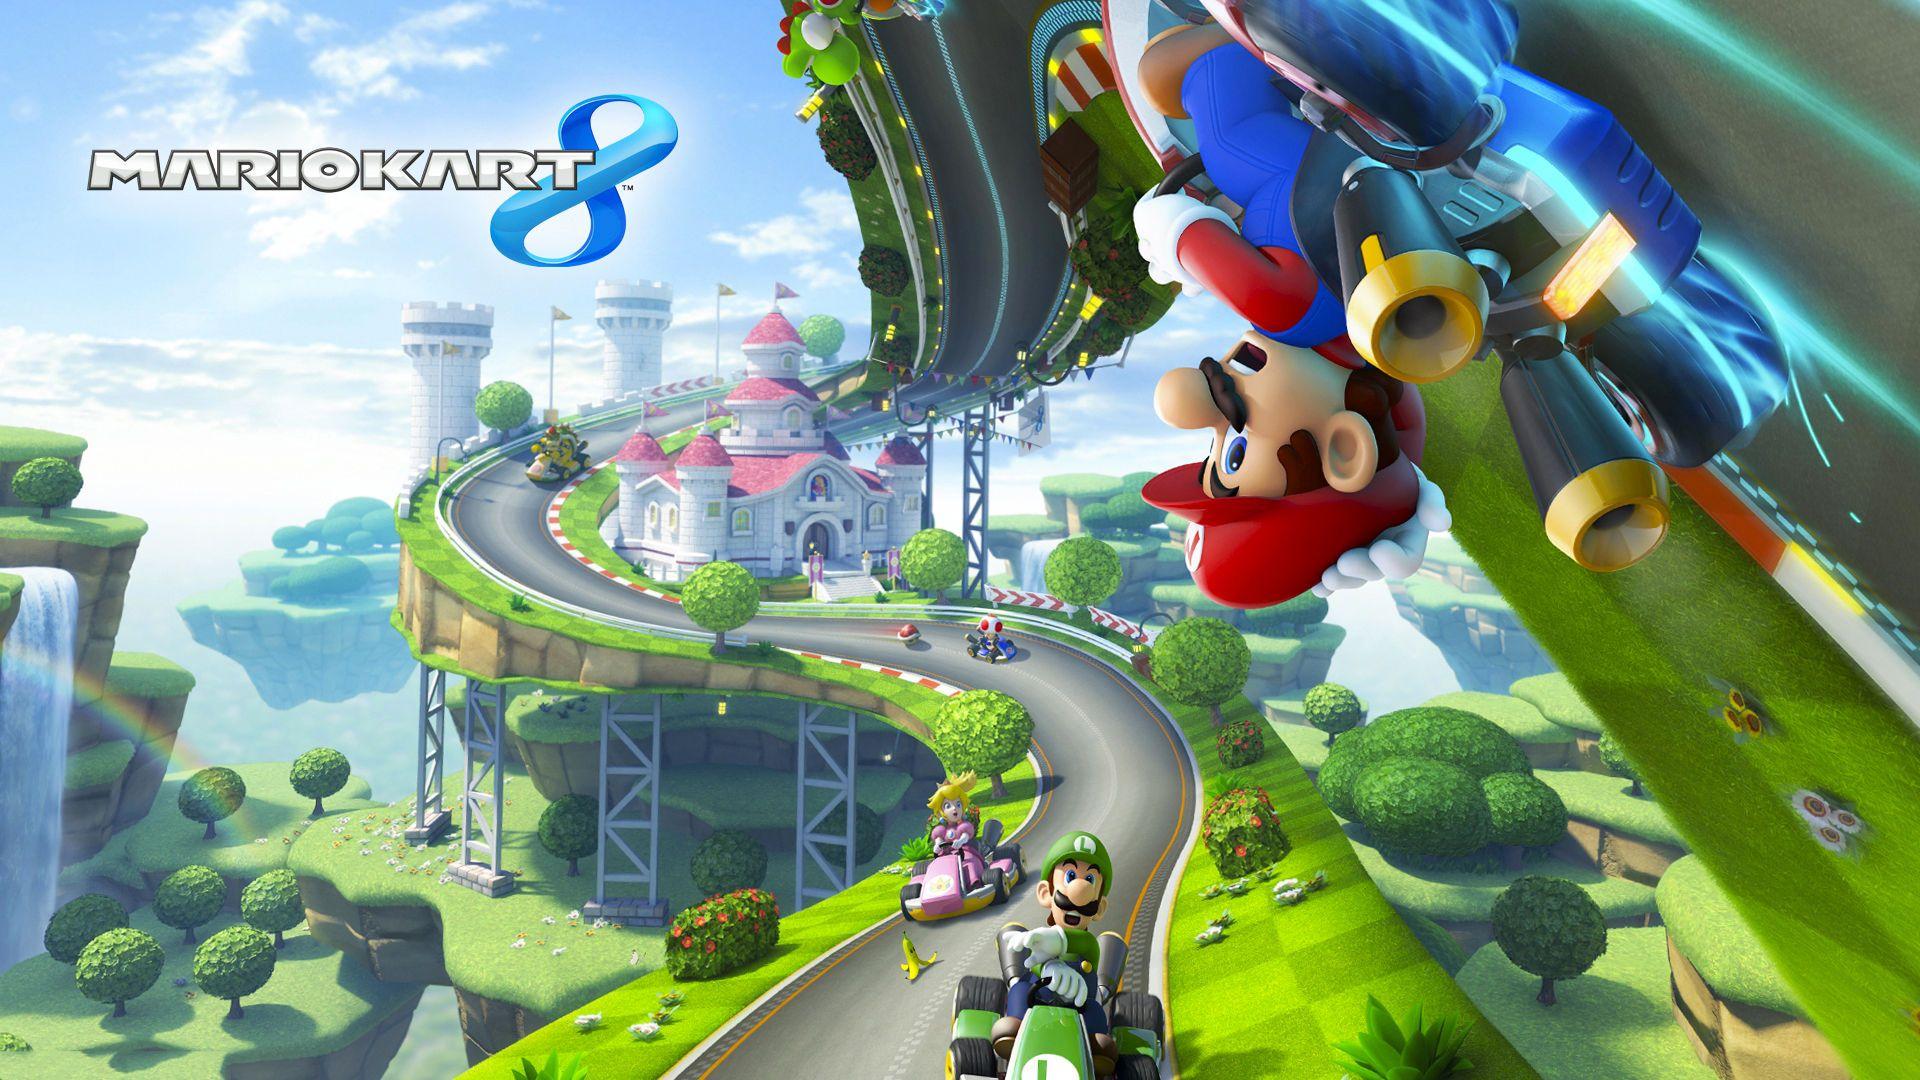 Mario kart 7 snes rainbow road comparison essay